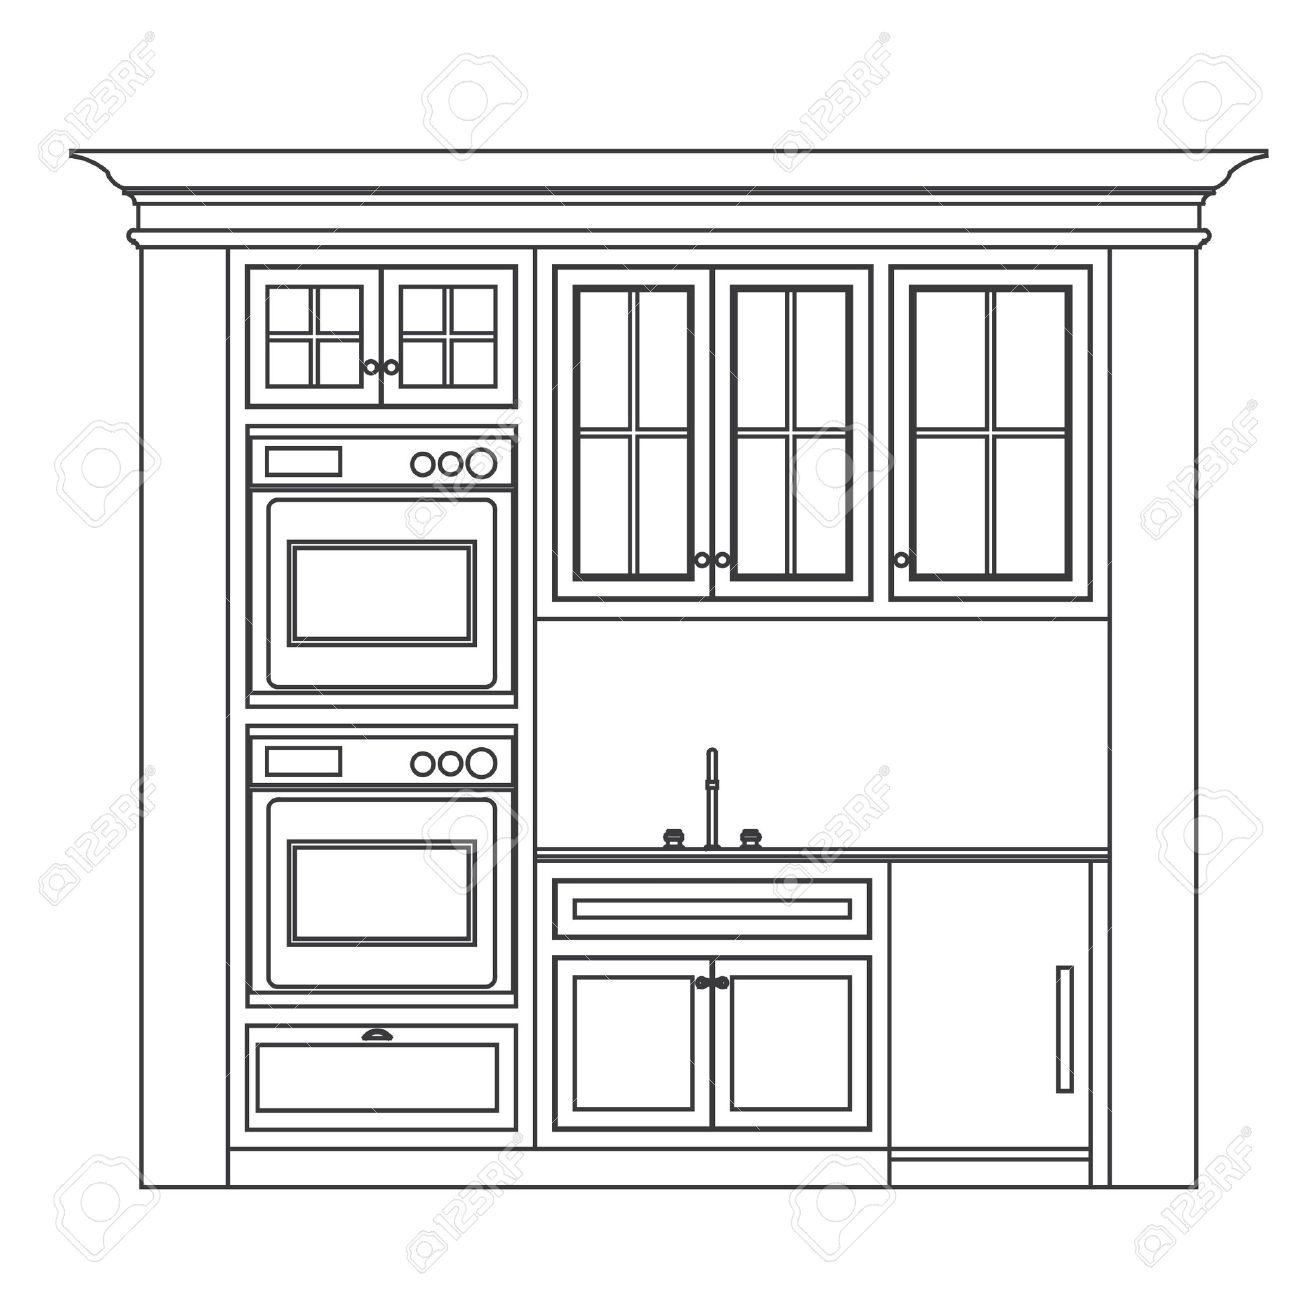 Dessiner cuisine en ligne sofag for Dessiner cuisine en ligne